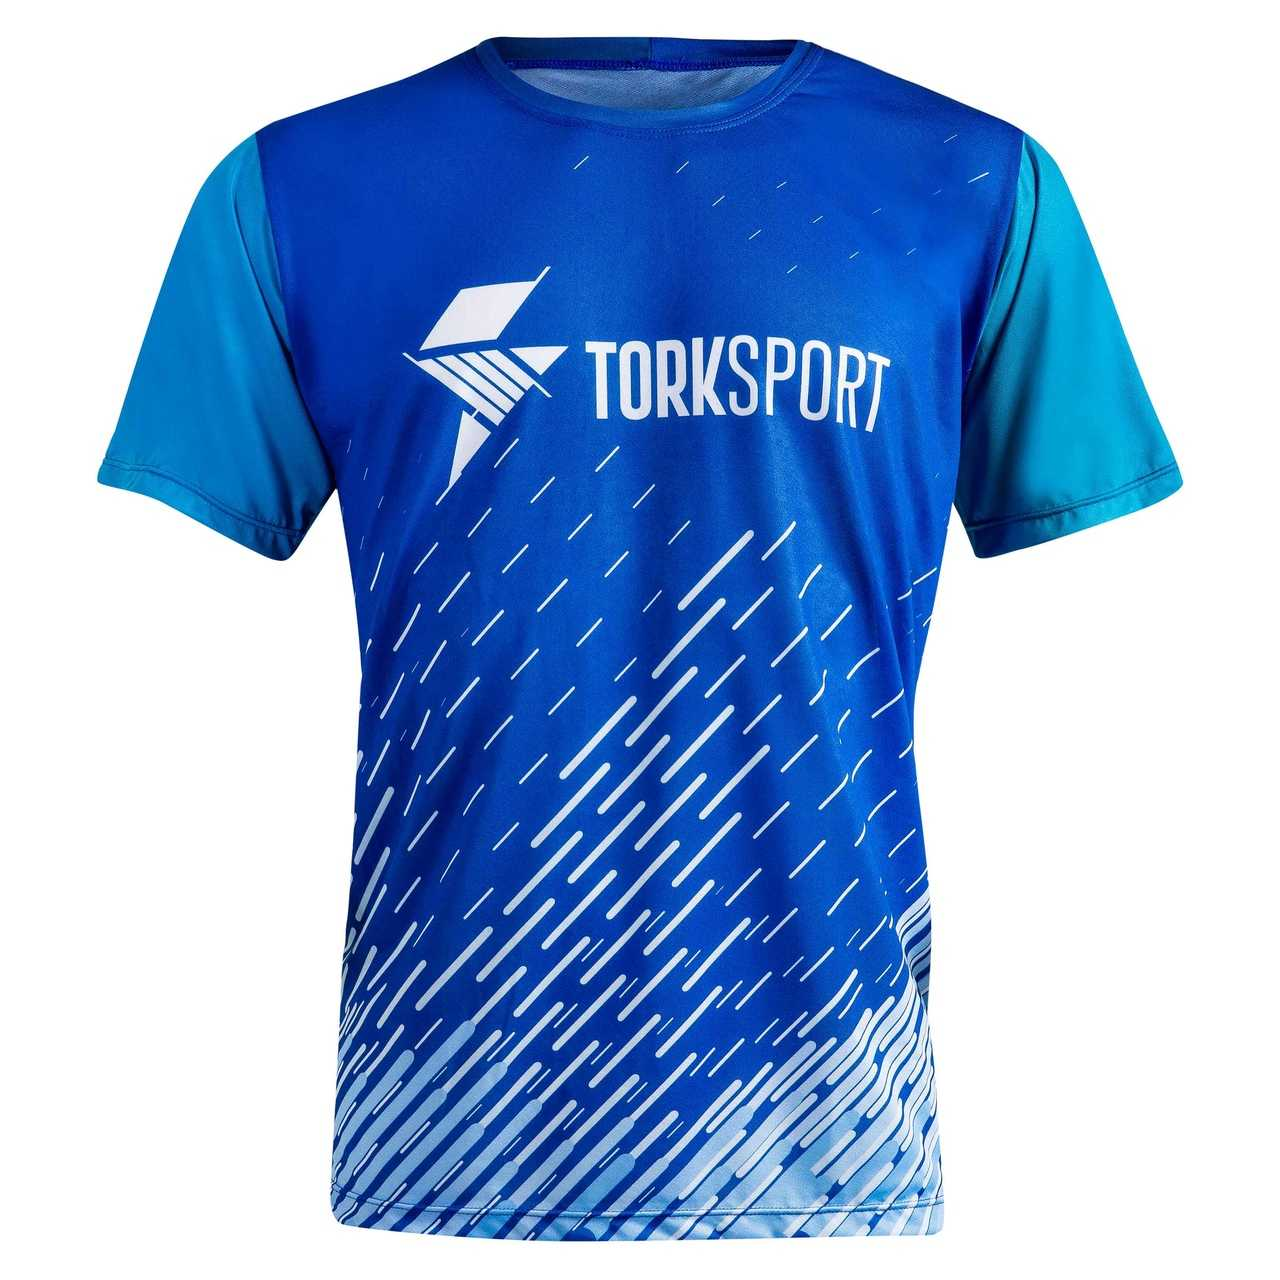 f387bc1d68 calca corrida masculino blue rain - Busca na Torksport